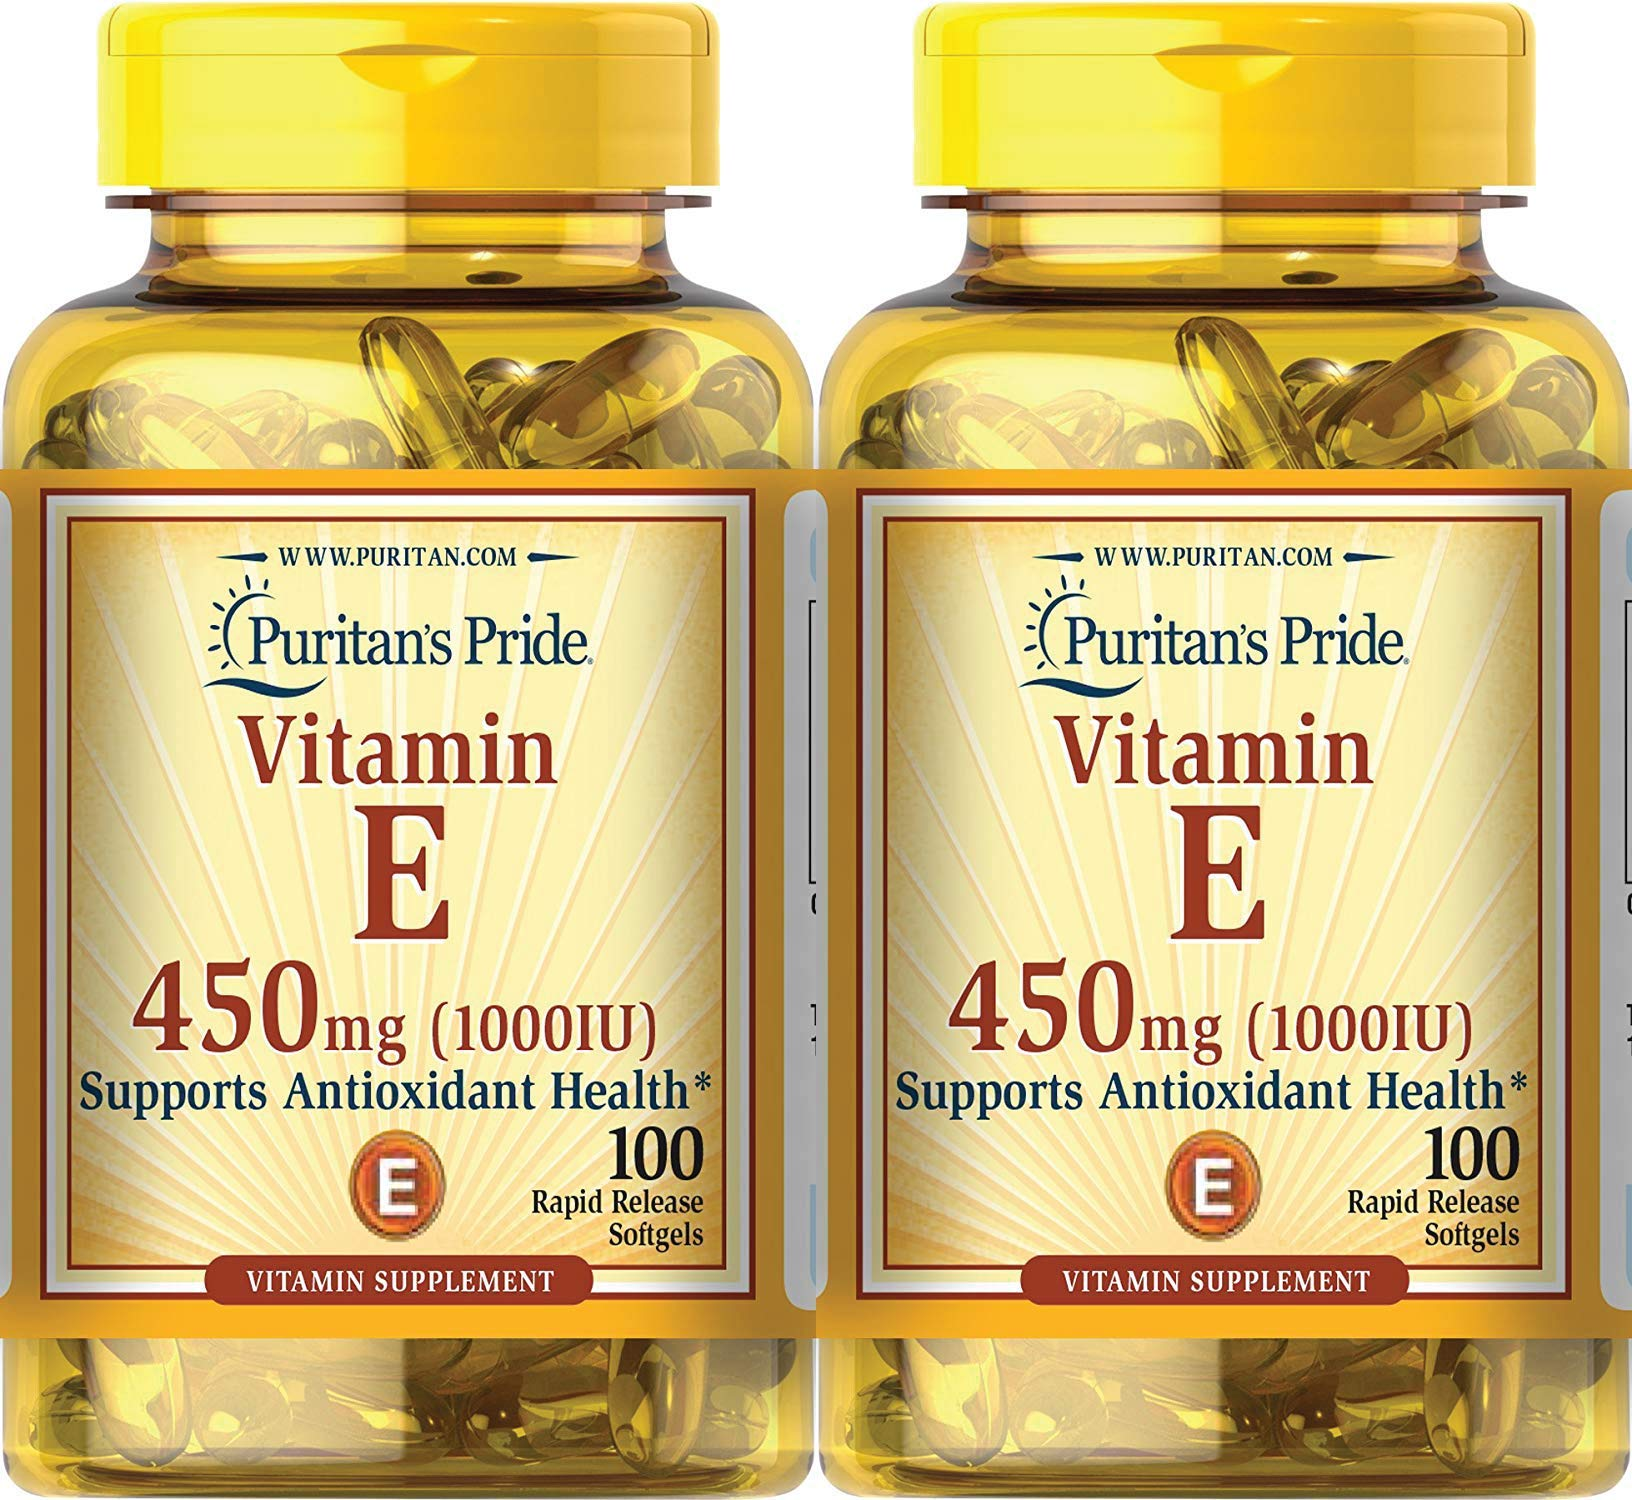 Puritan's Pride Vitamin E 1000 IU Soft Gels,100 Count (2 Pack) by Puritan's Pride